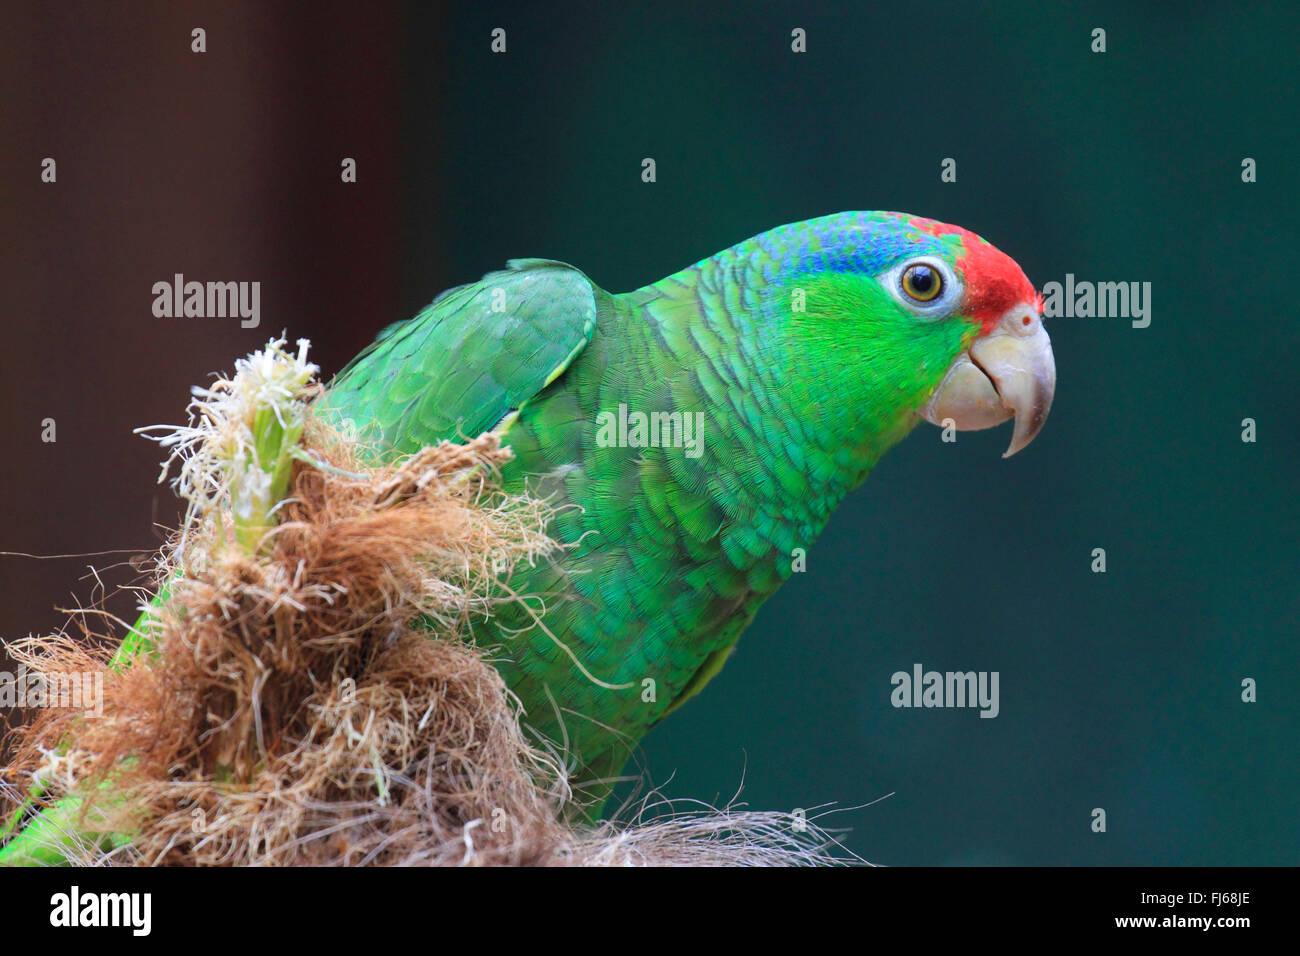 Green-cheeked amazon (Amazona viridigenalis), avec des épis de maïs Photo Stock